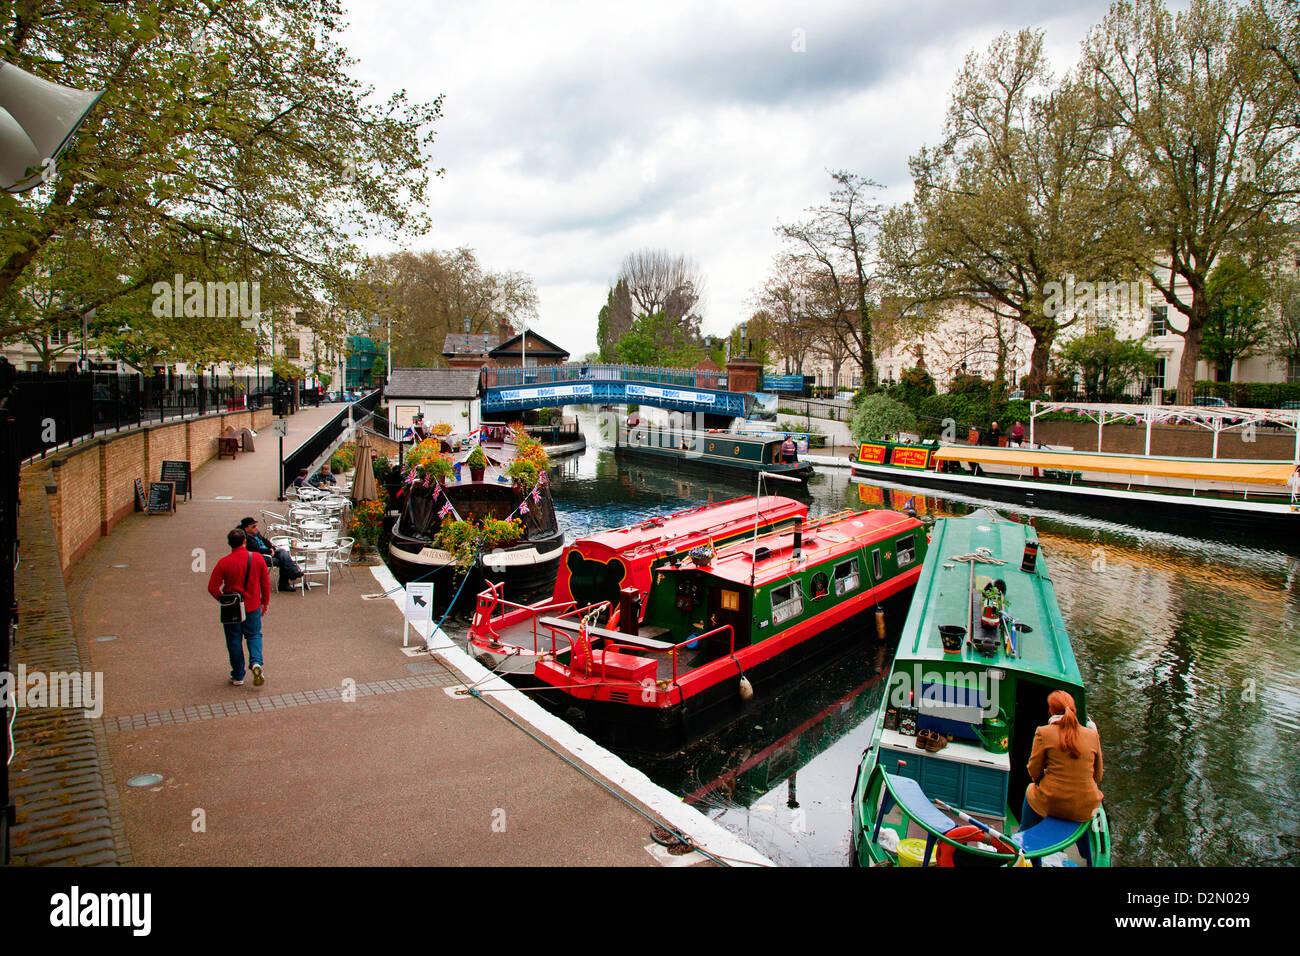 Blick entlang der Grand Union Canal, kleine Venedig, Maida Vale, London, England, Vereinigtes Königreich, Europa Stockbild